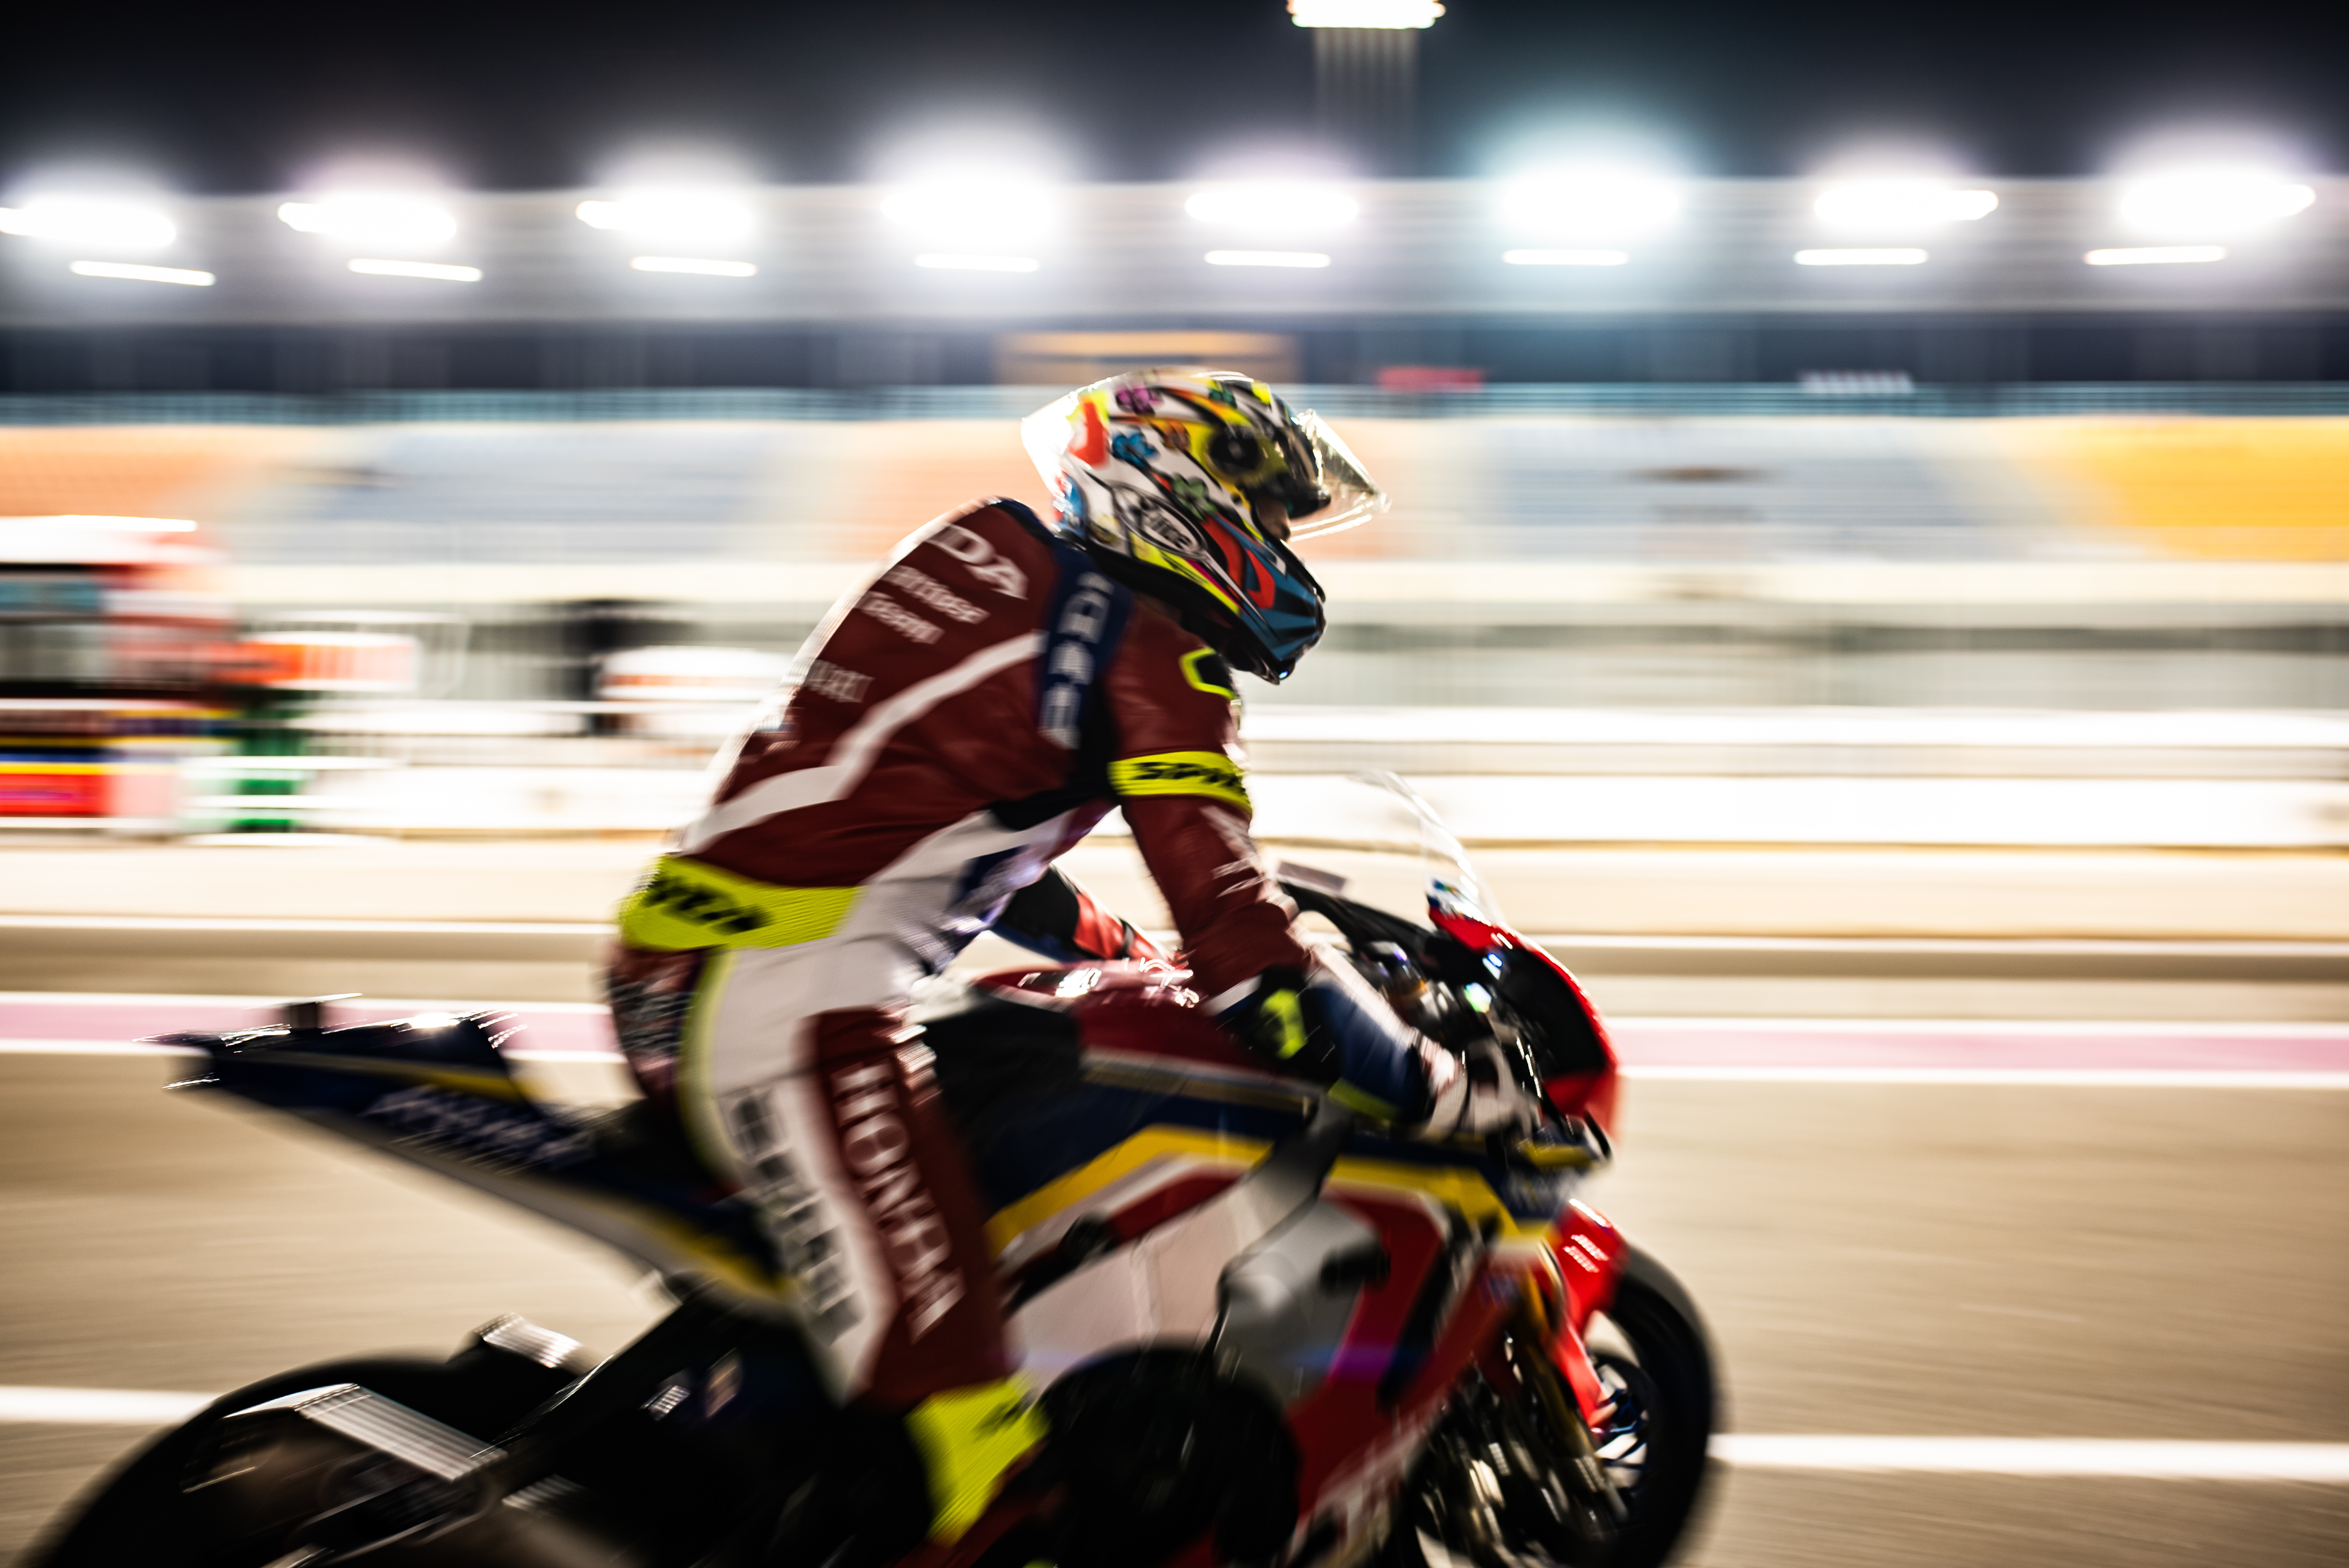 Moriwaki_Althea_Honda_Team_Qatar_80